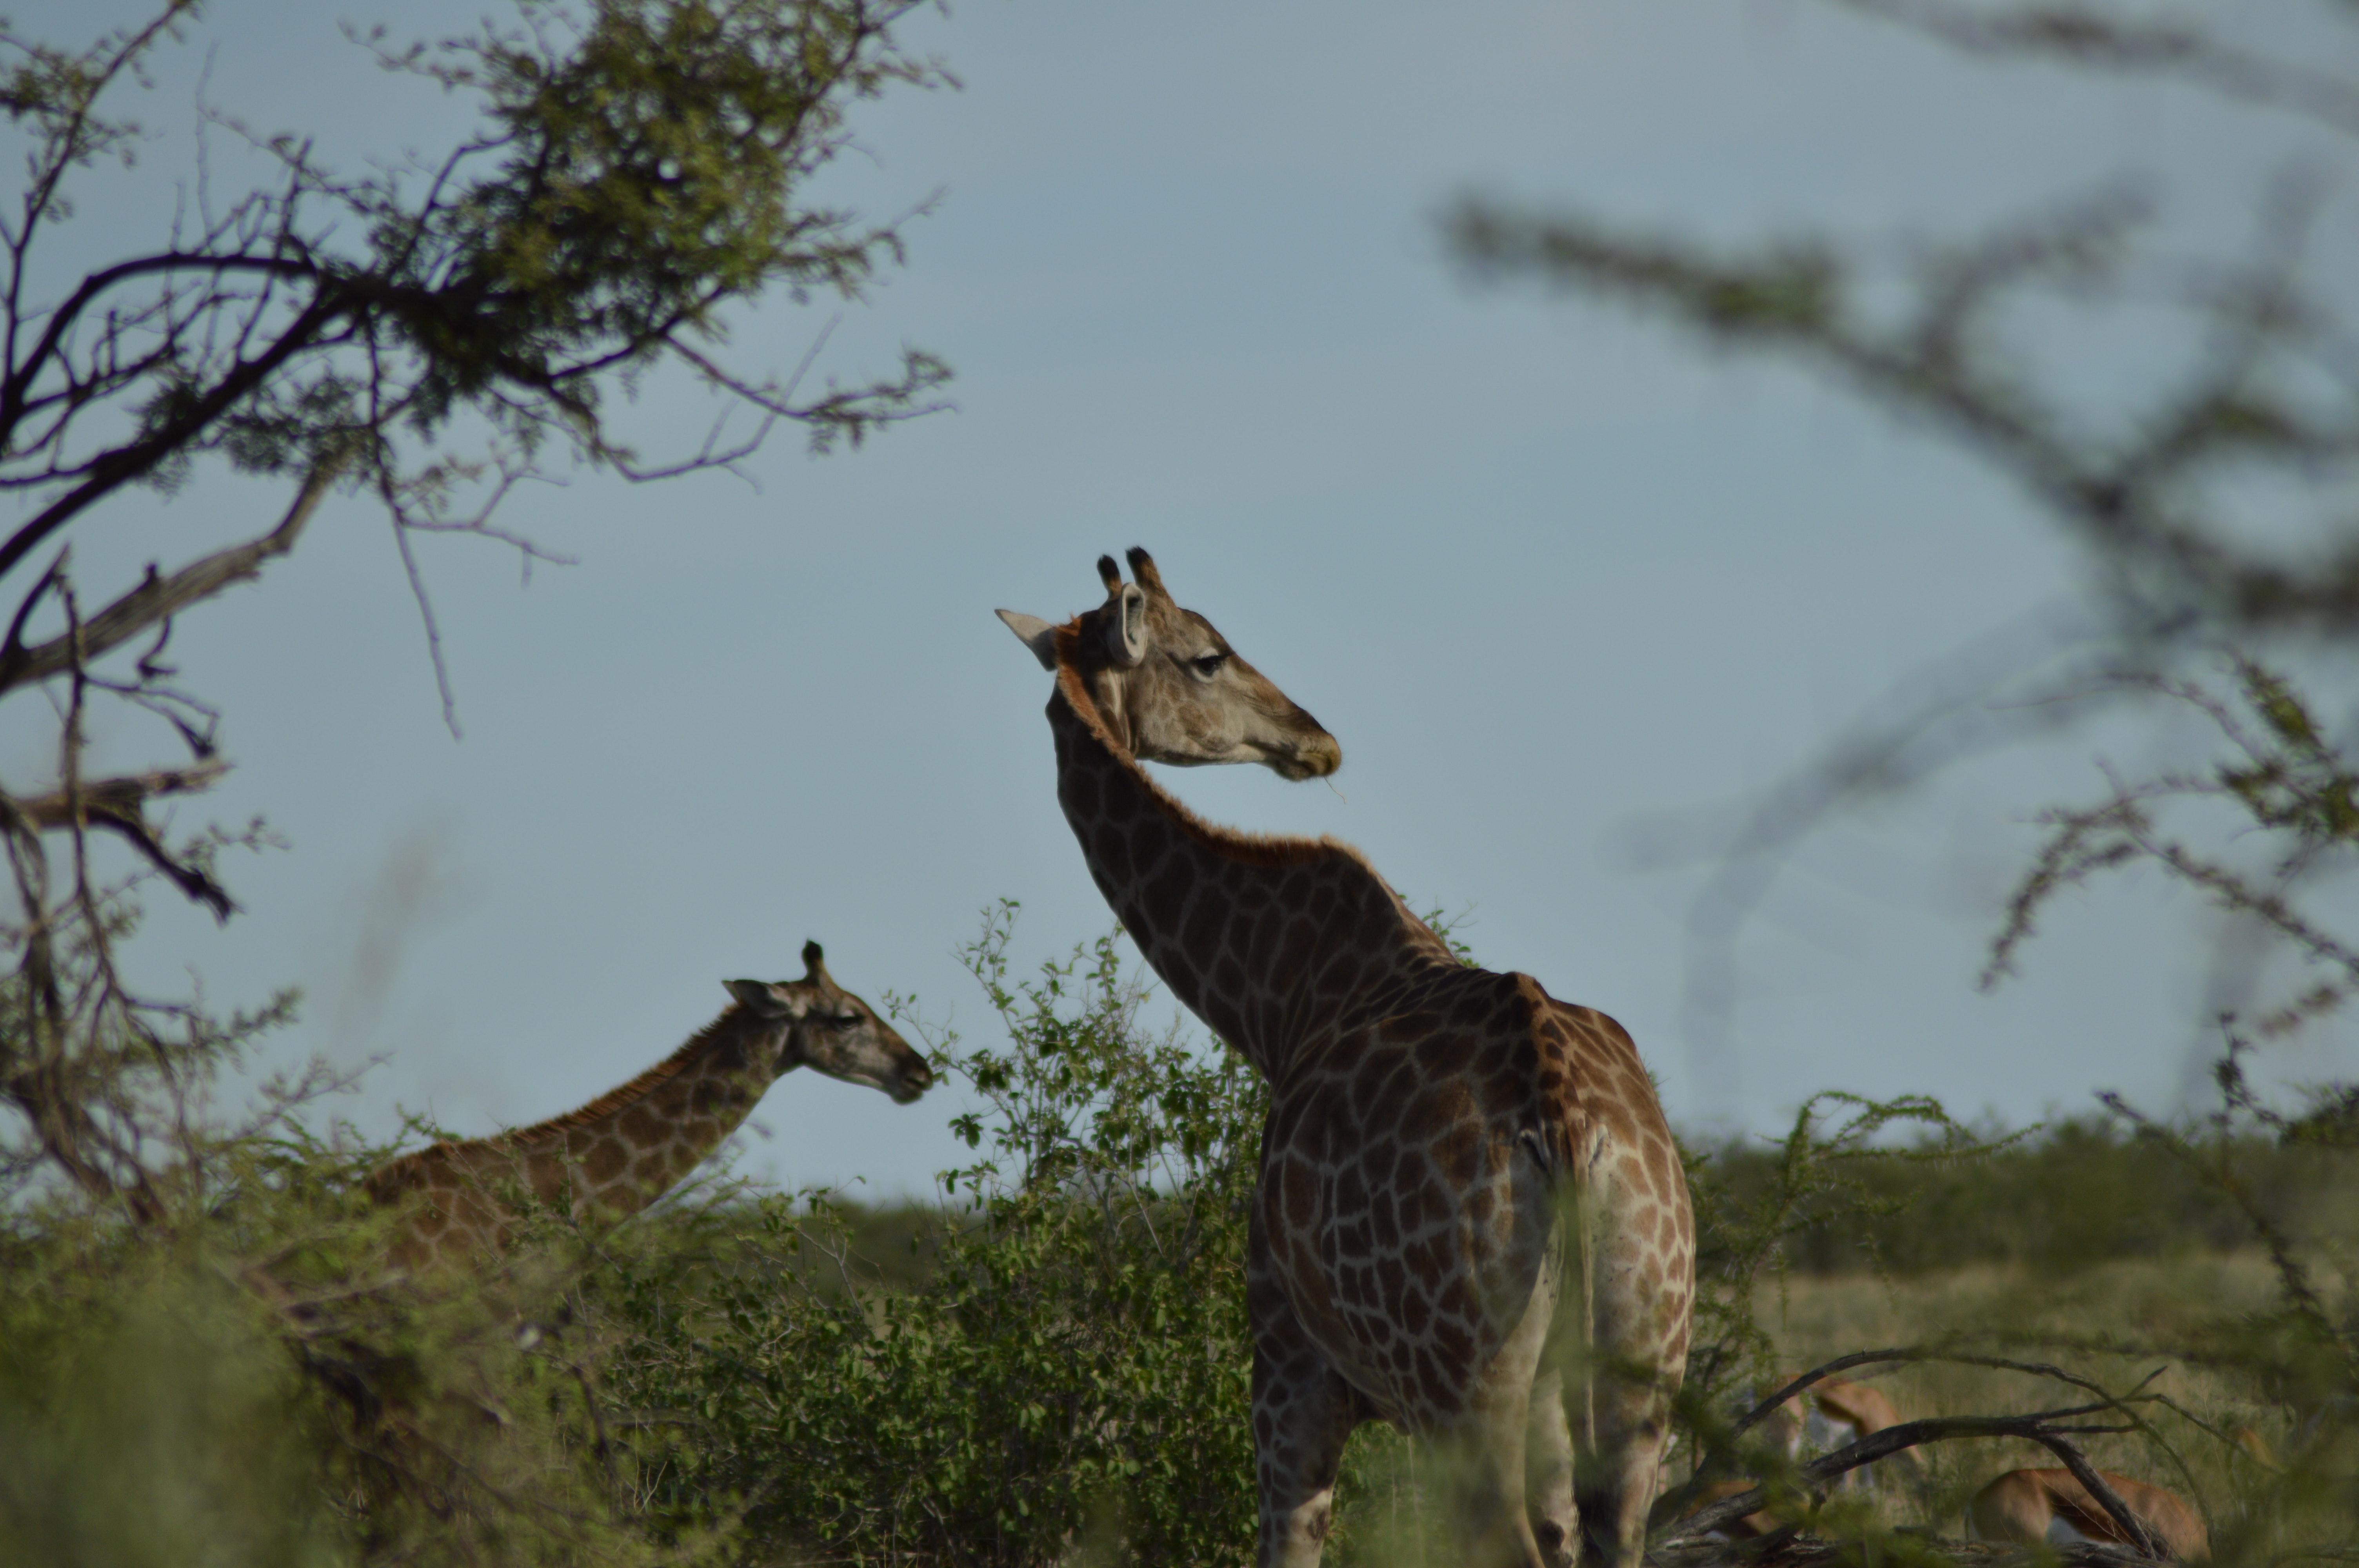 Hdの壁紙 アフリカ キリンの無料の写真素材